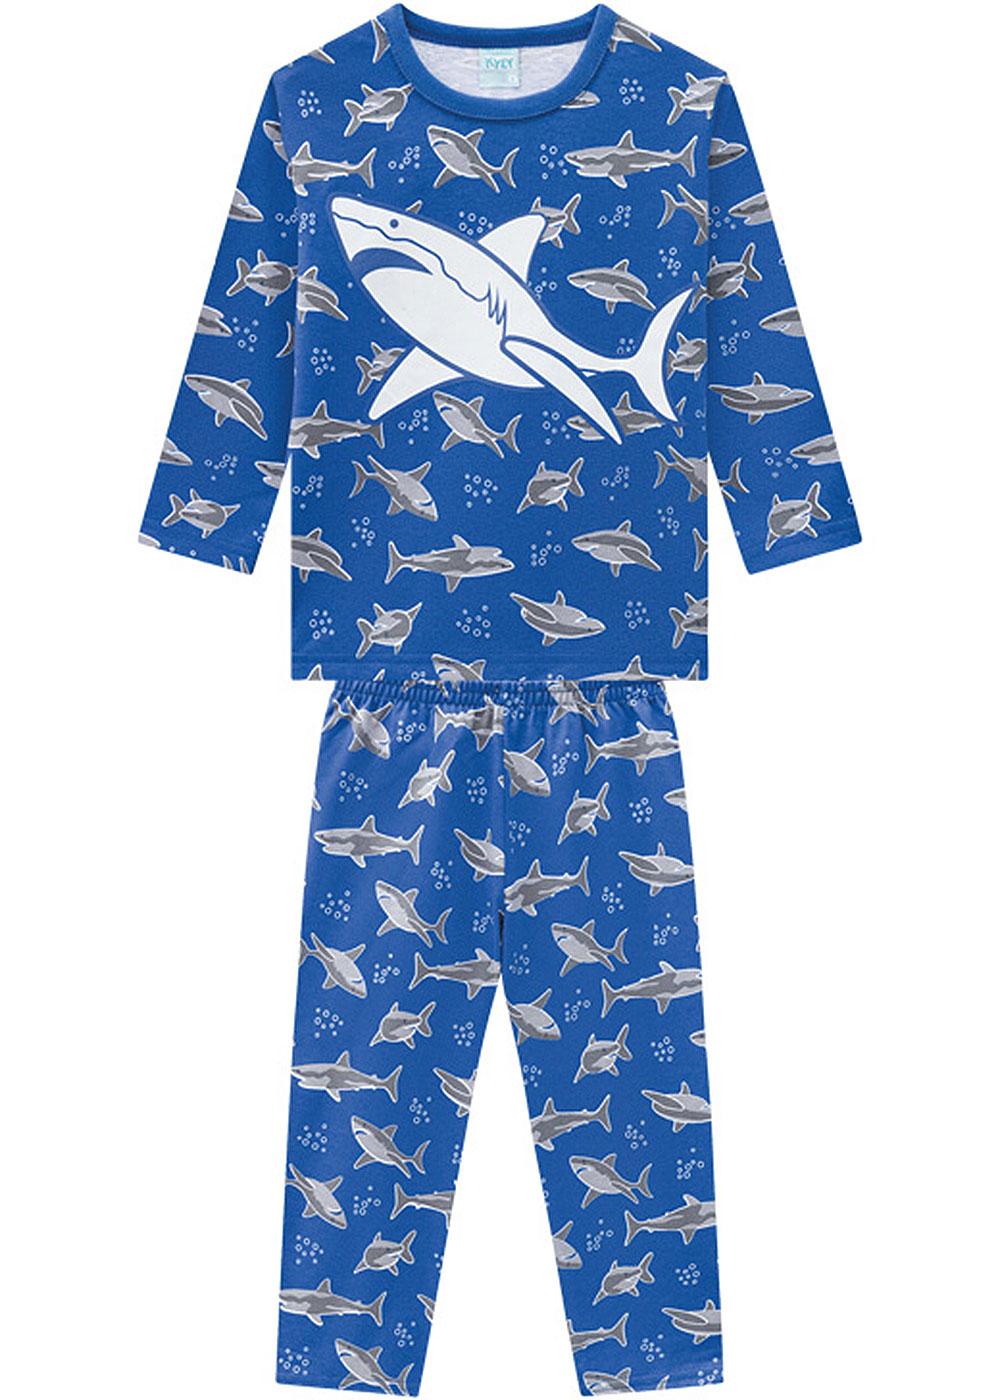 Pijama Infantil Masculino Inverno Azul Shark Brilha no Escuro - Kyly